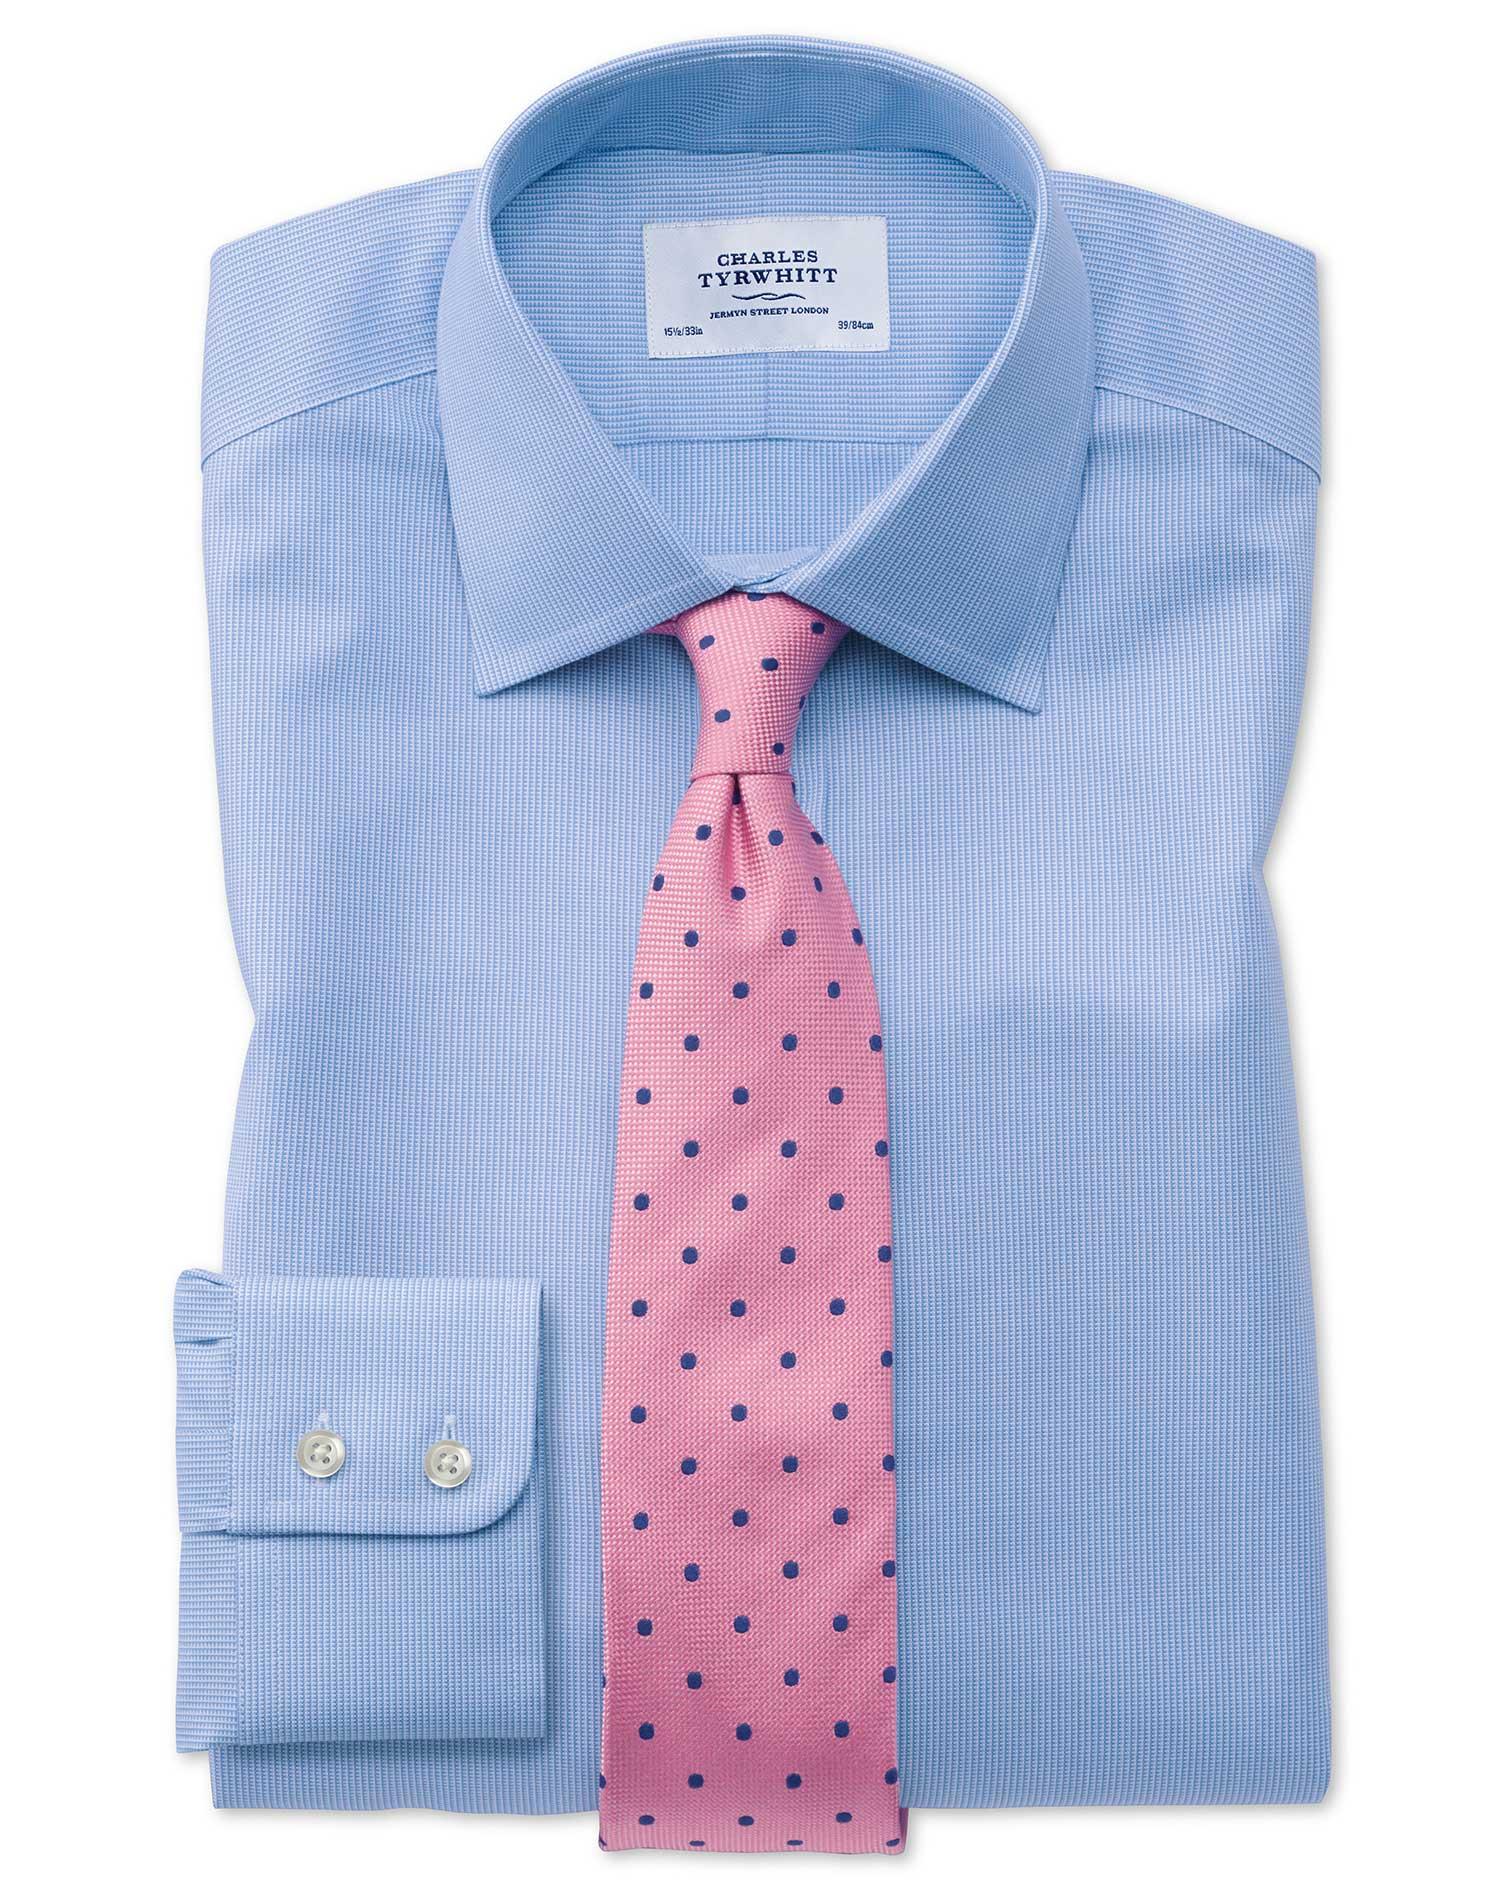 Classic Fit Oxford Sky Blue Shirt Charles Tyrwhitt